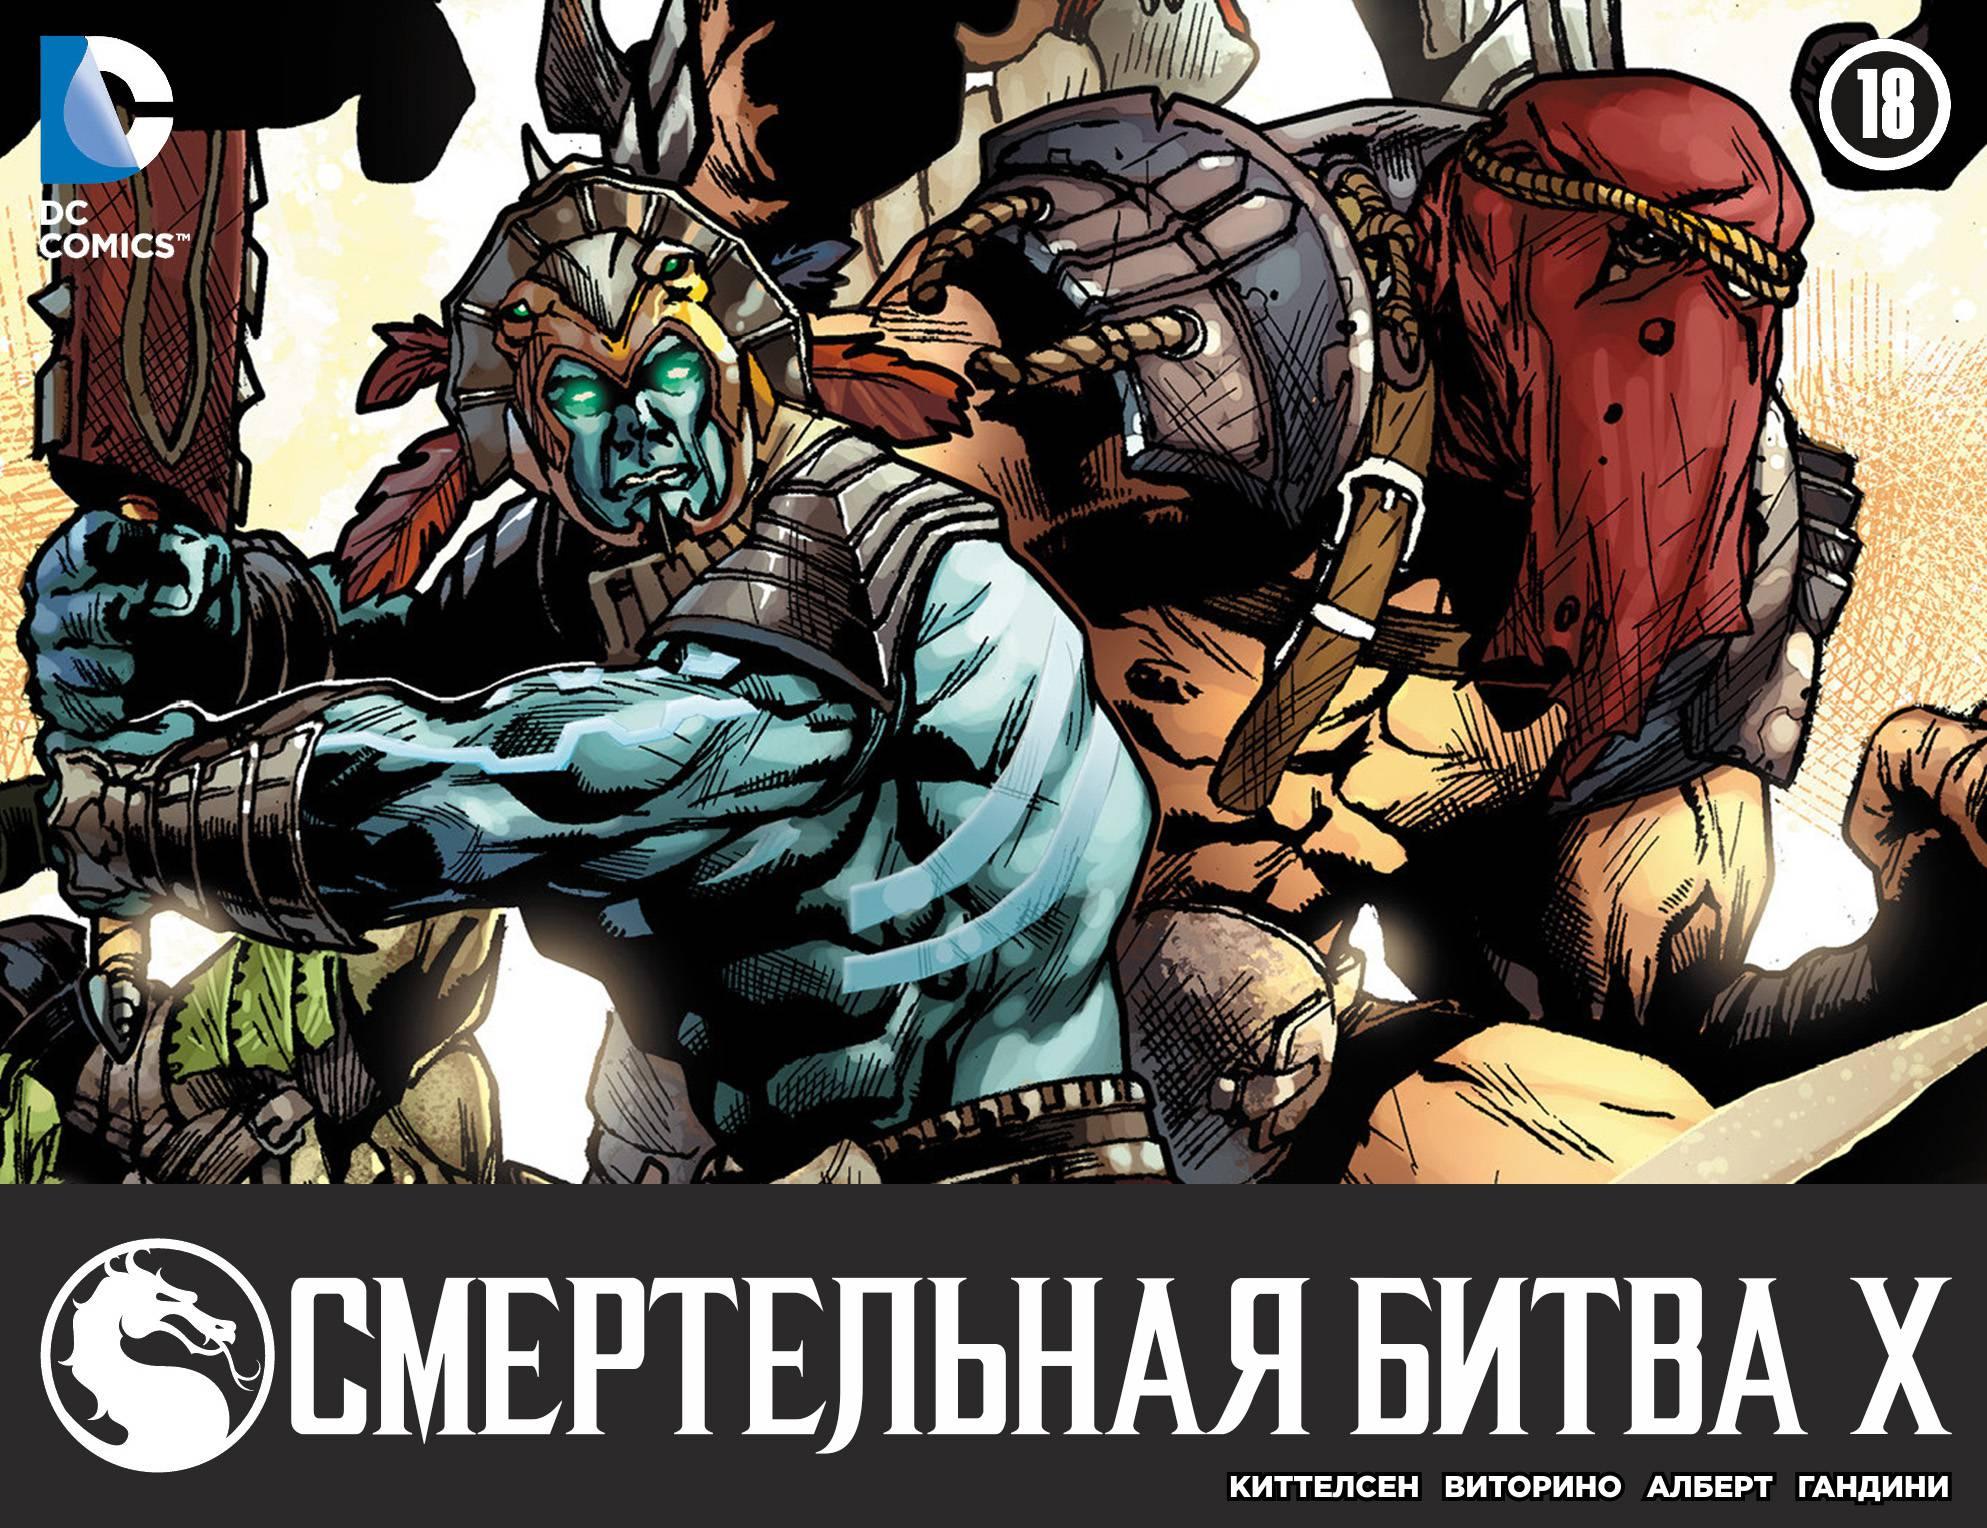 Смертельная Битва Икс №18 онлайн